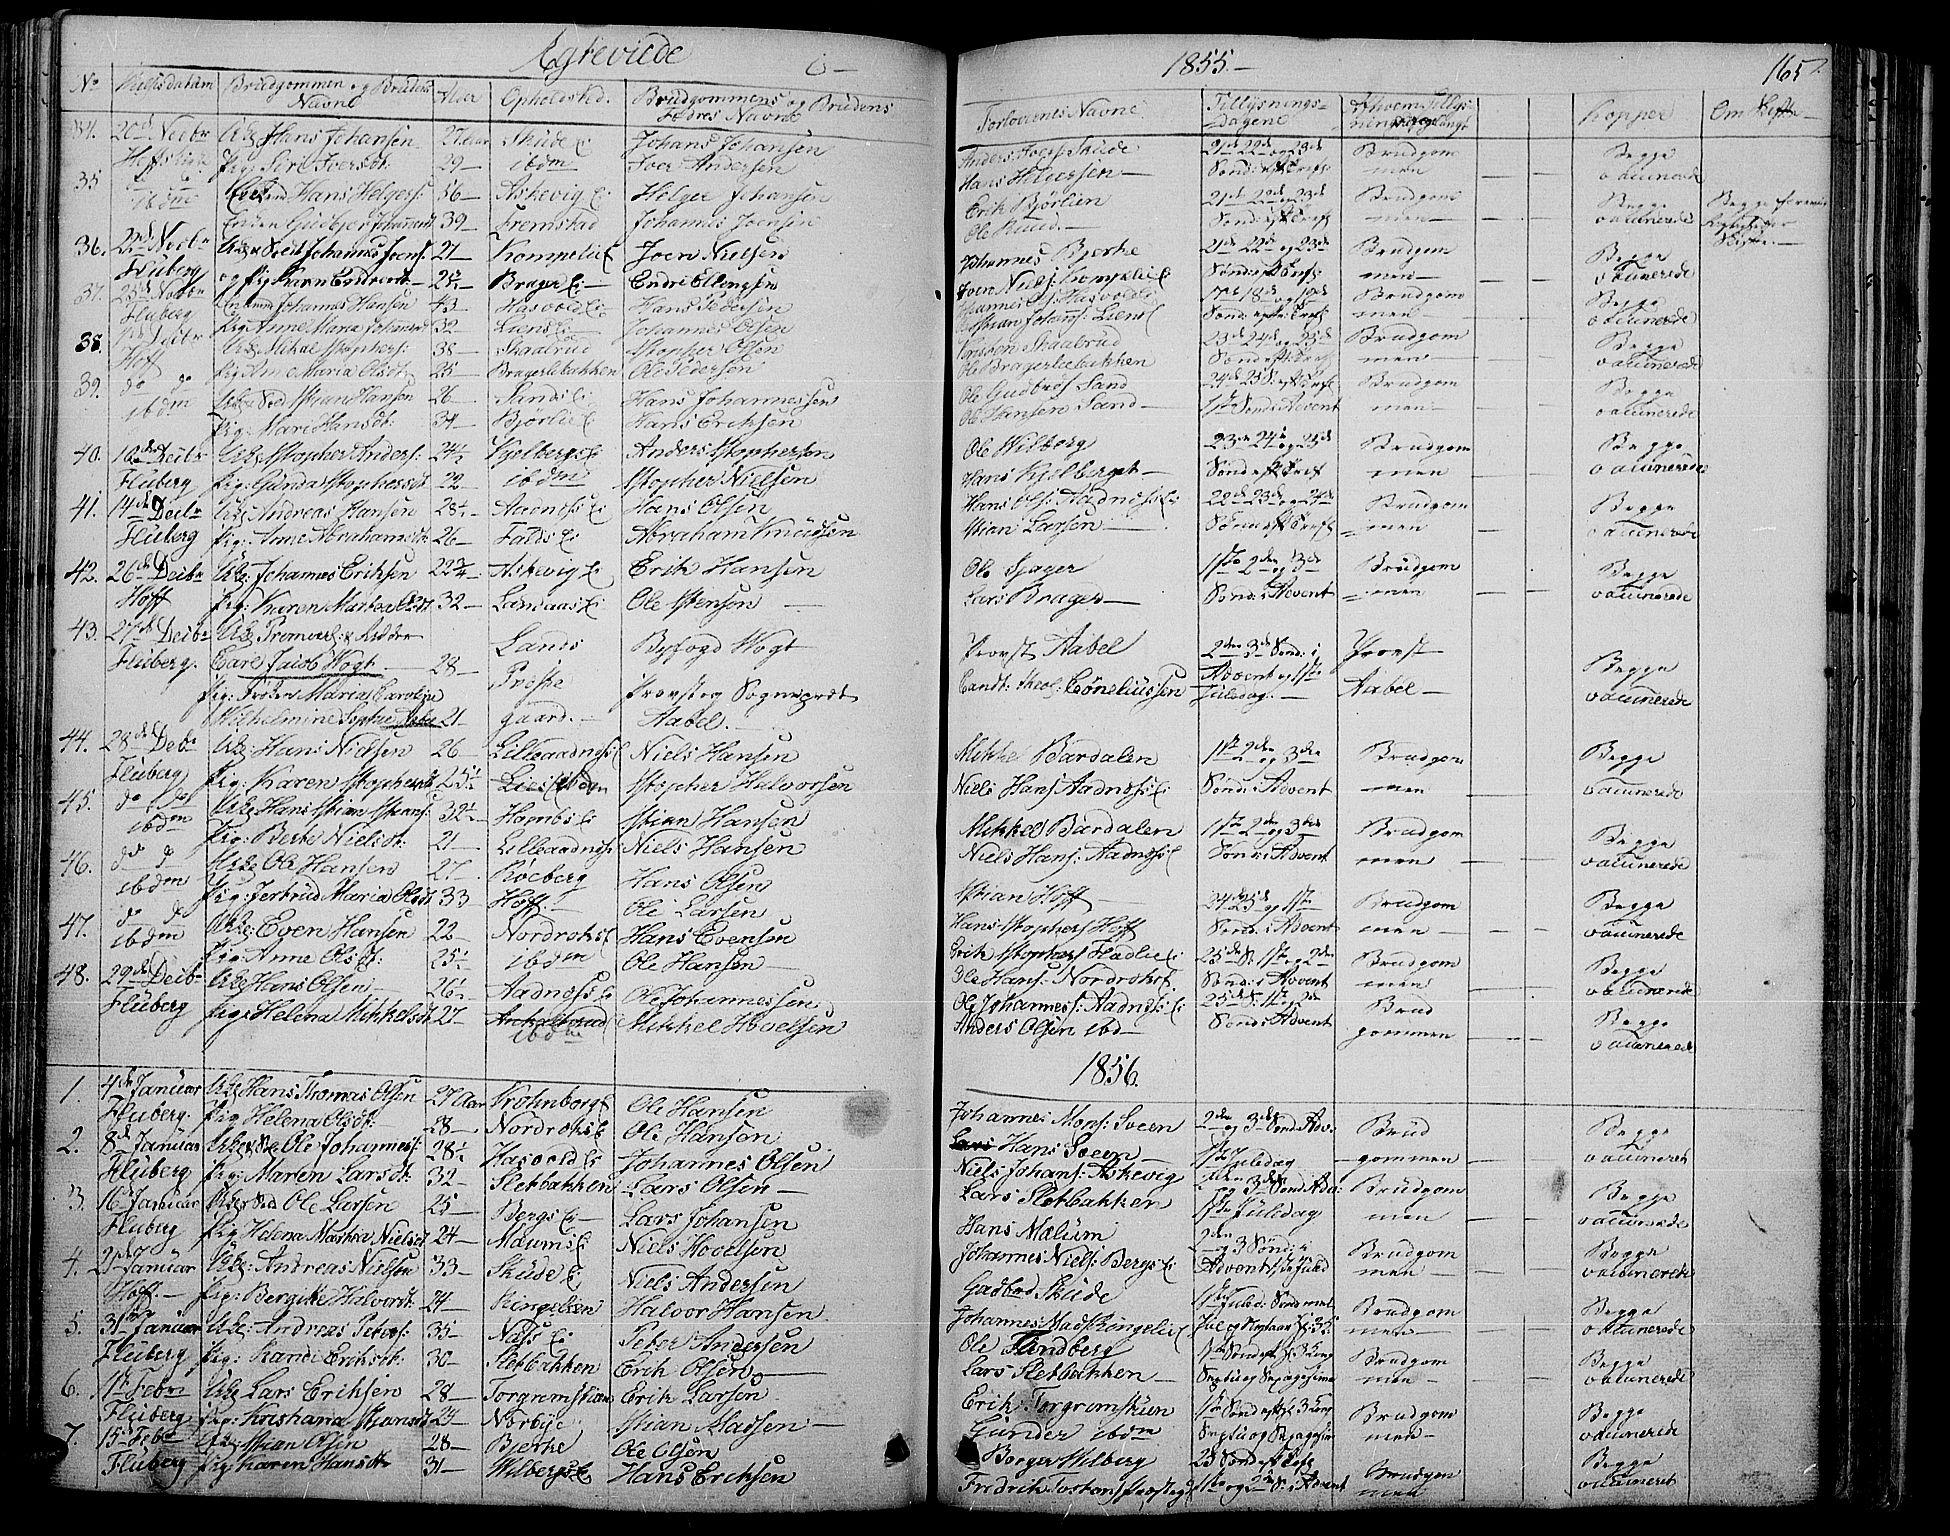 SAH, Søndre Land prestekontor, L/L0001: Klokkerbok nr. 1, 1849-1883, s. 165